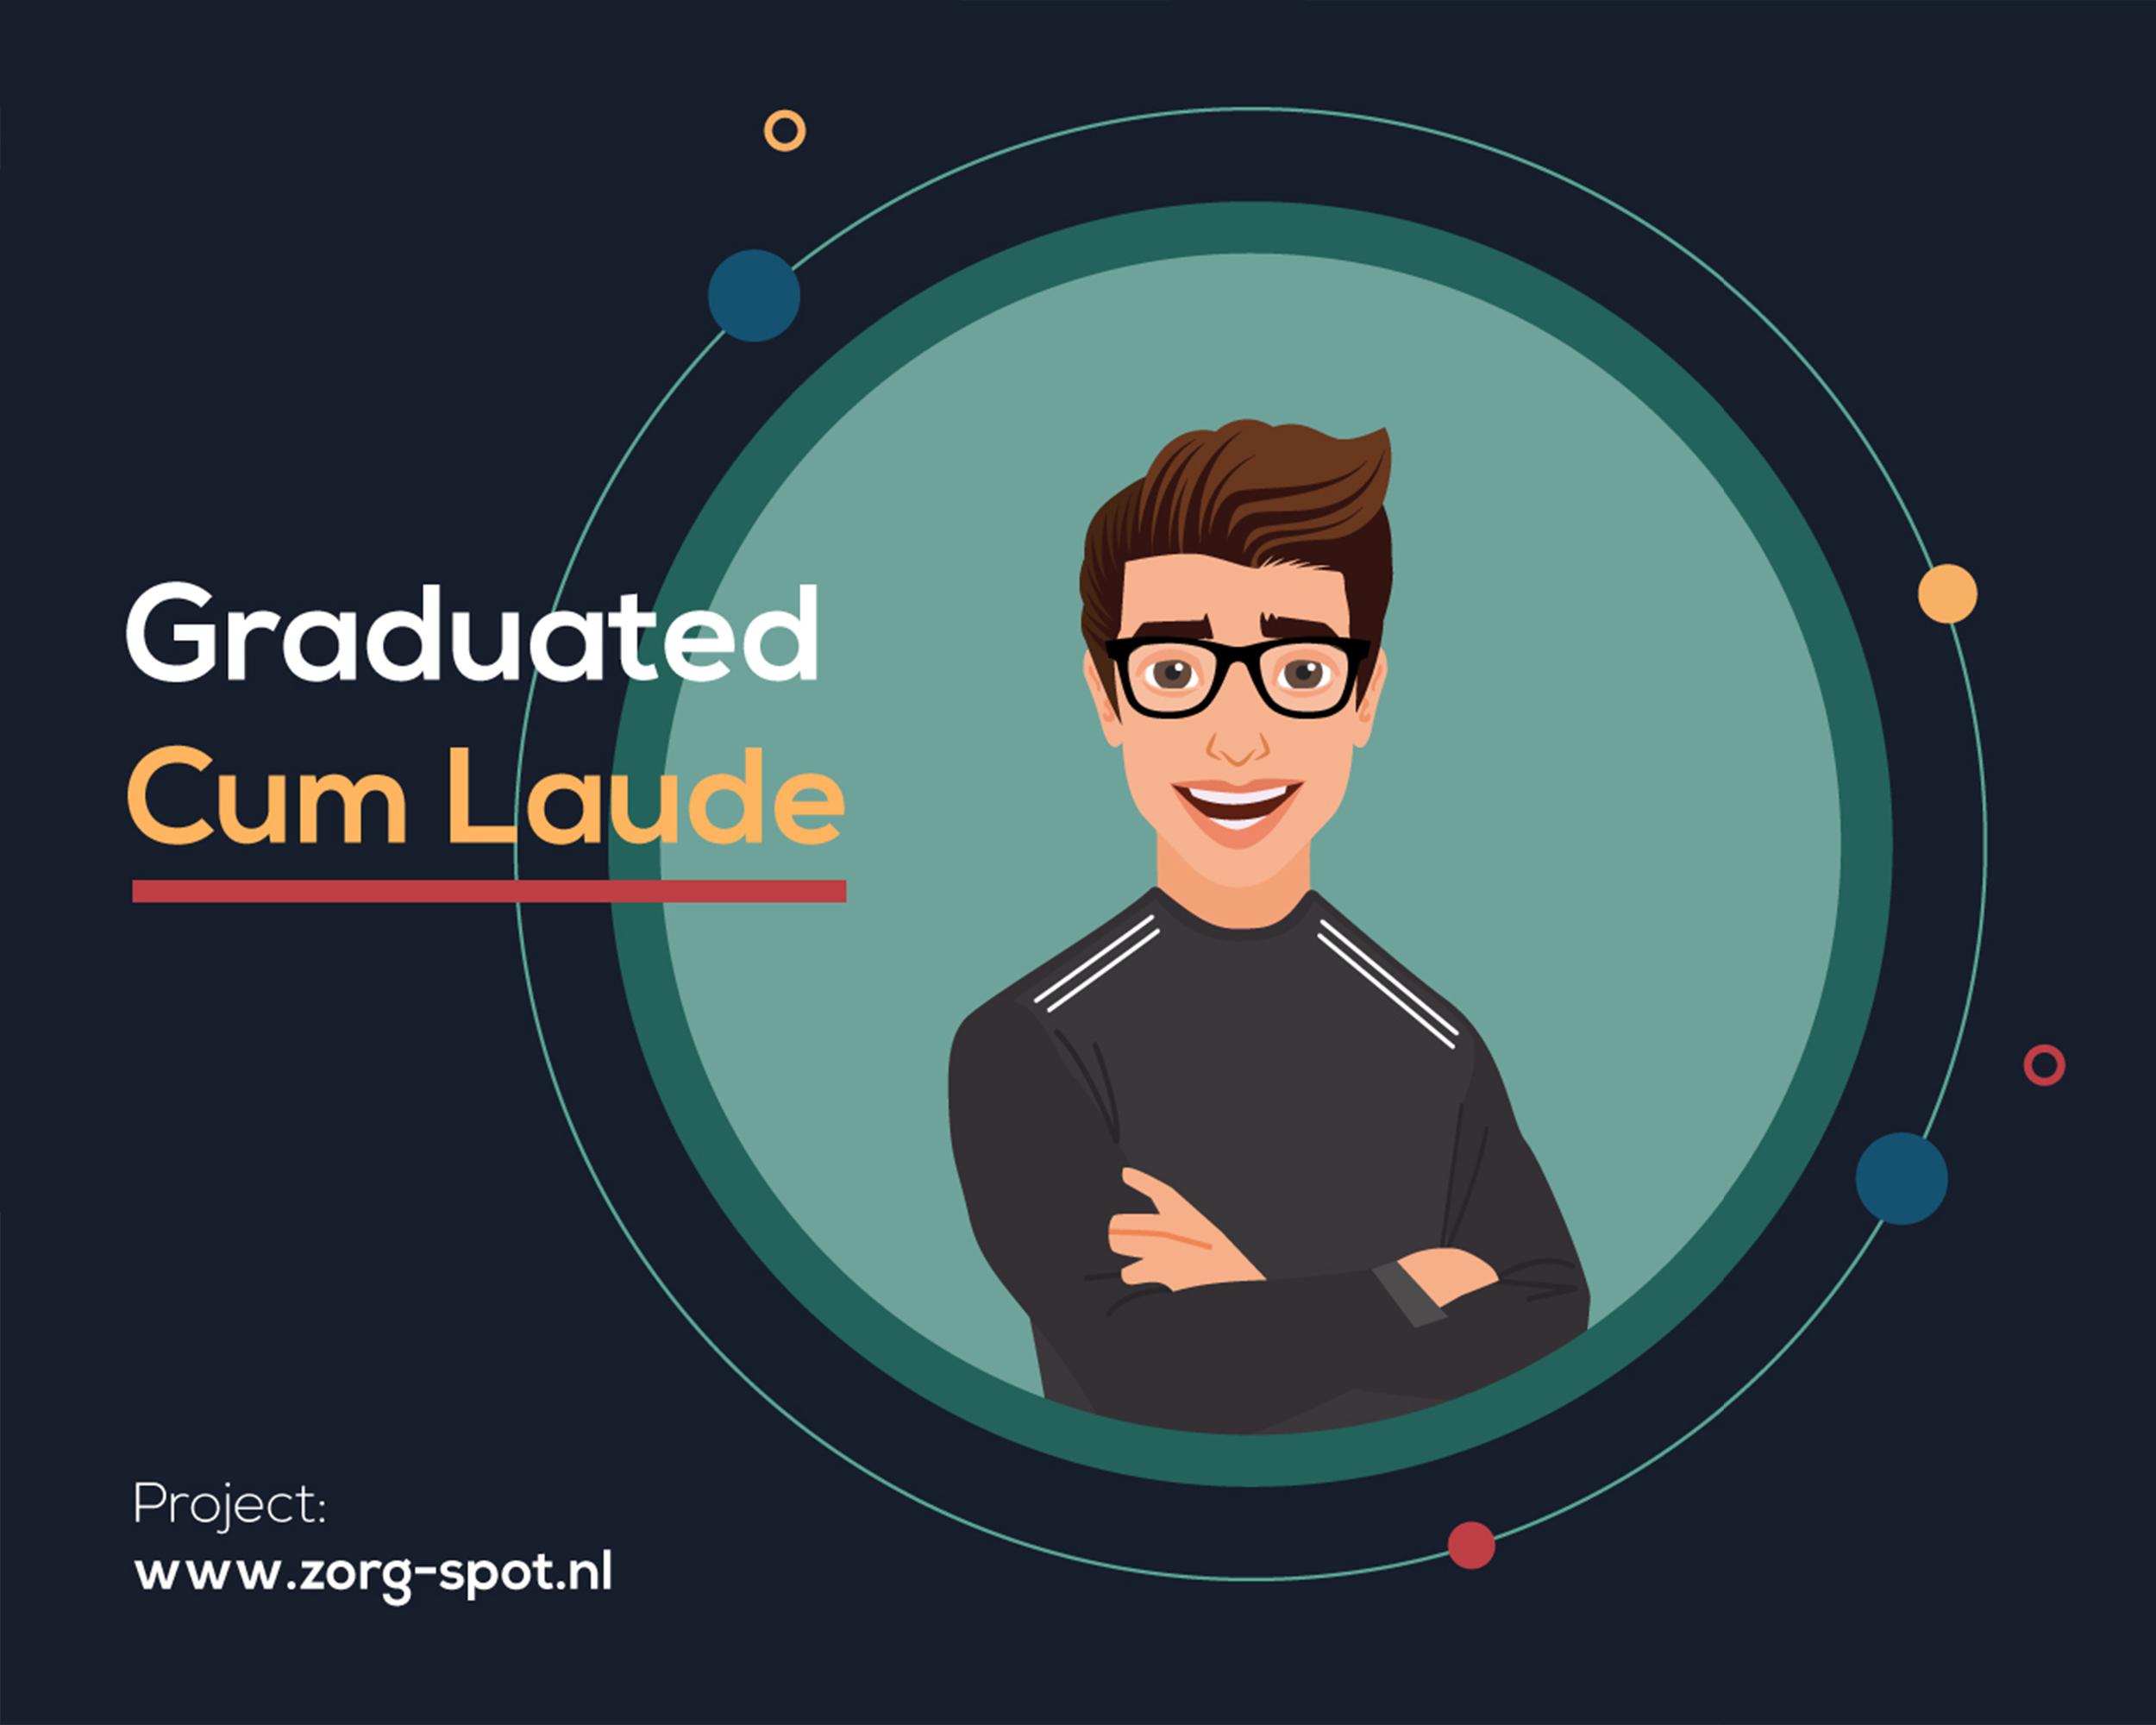 Zorg Spot - Gianni Ritchie - Graduated Cum Laude